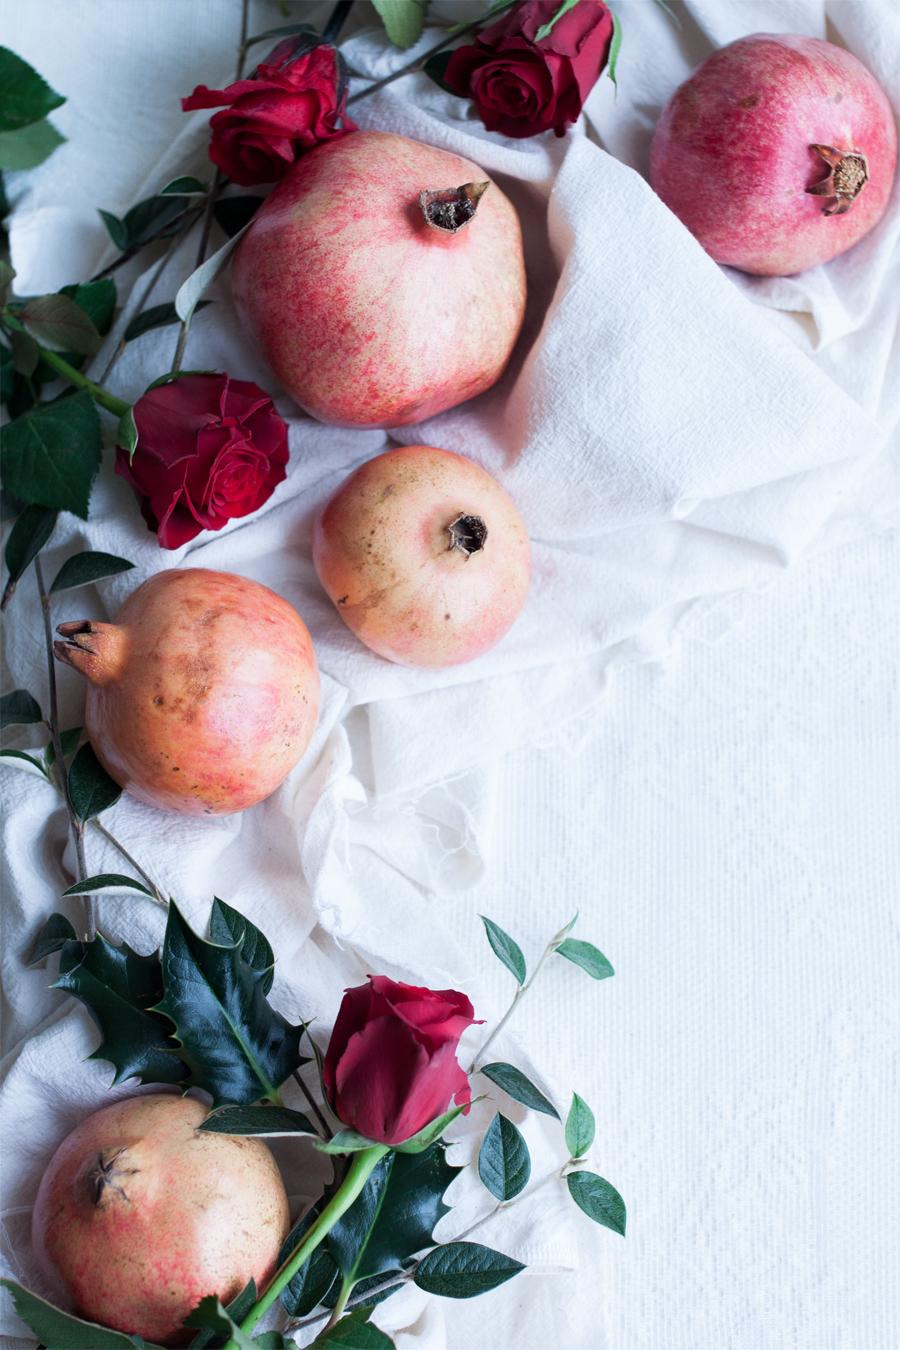 Roasted Red Kuri Squash with Sumac, Pomegranates and Greens recipe - The Little Plantation